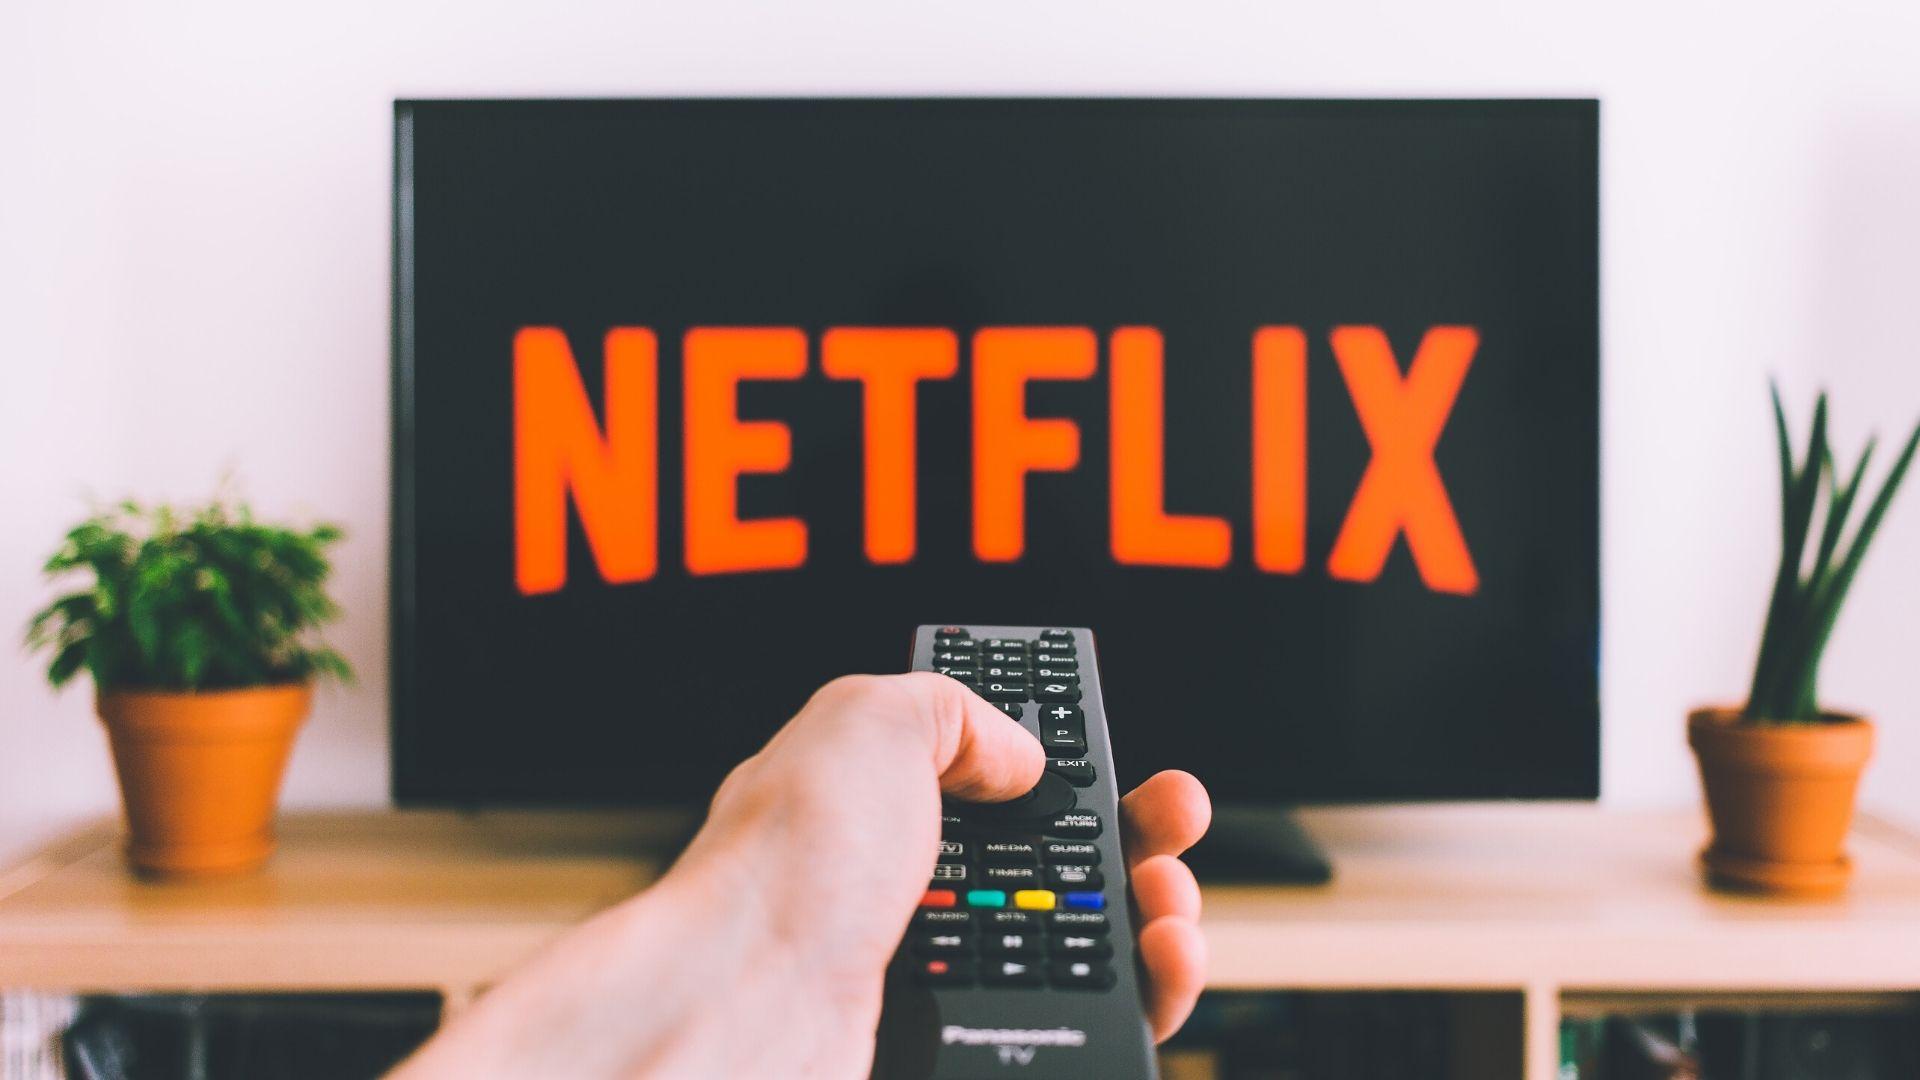 Netflix watch party 15:30